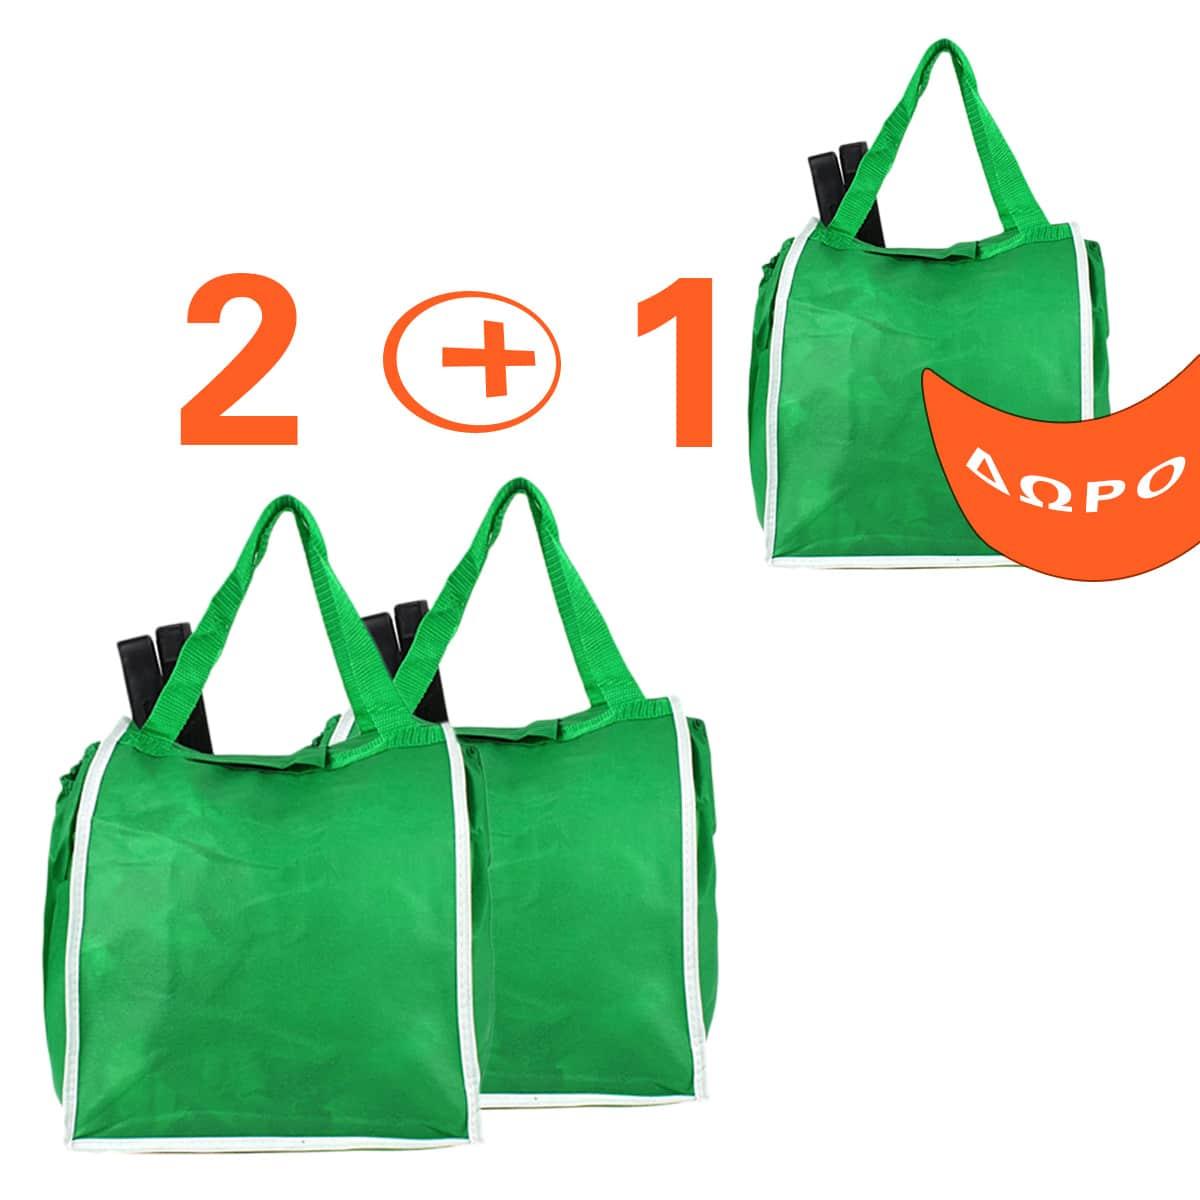 10_70400_4-Tsanta-trolley-shopping-pollaplon-xriseon-akamatra-2+1-dorob